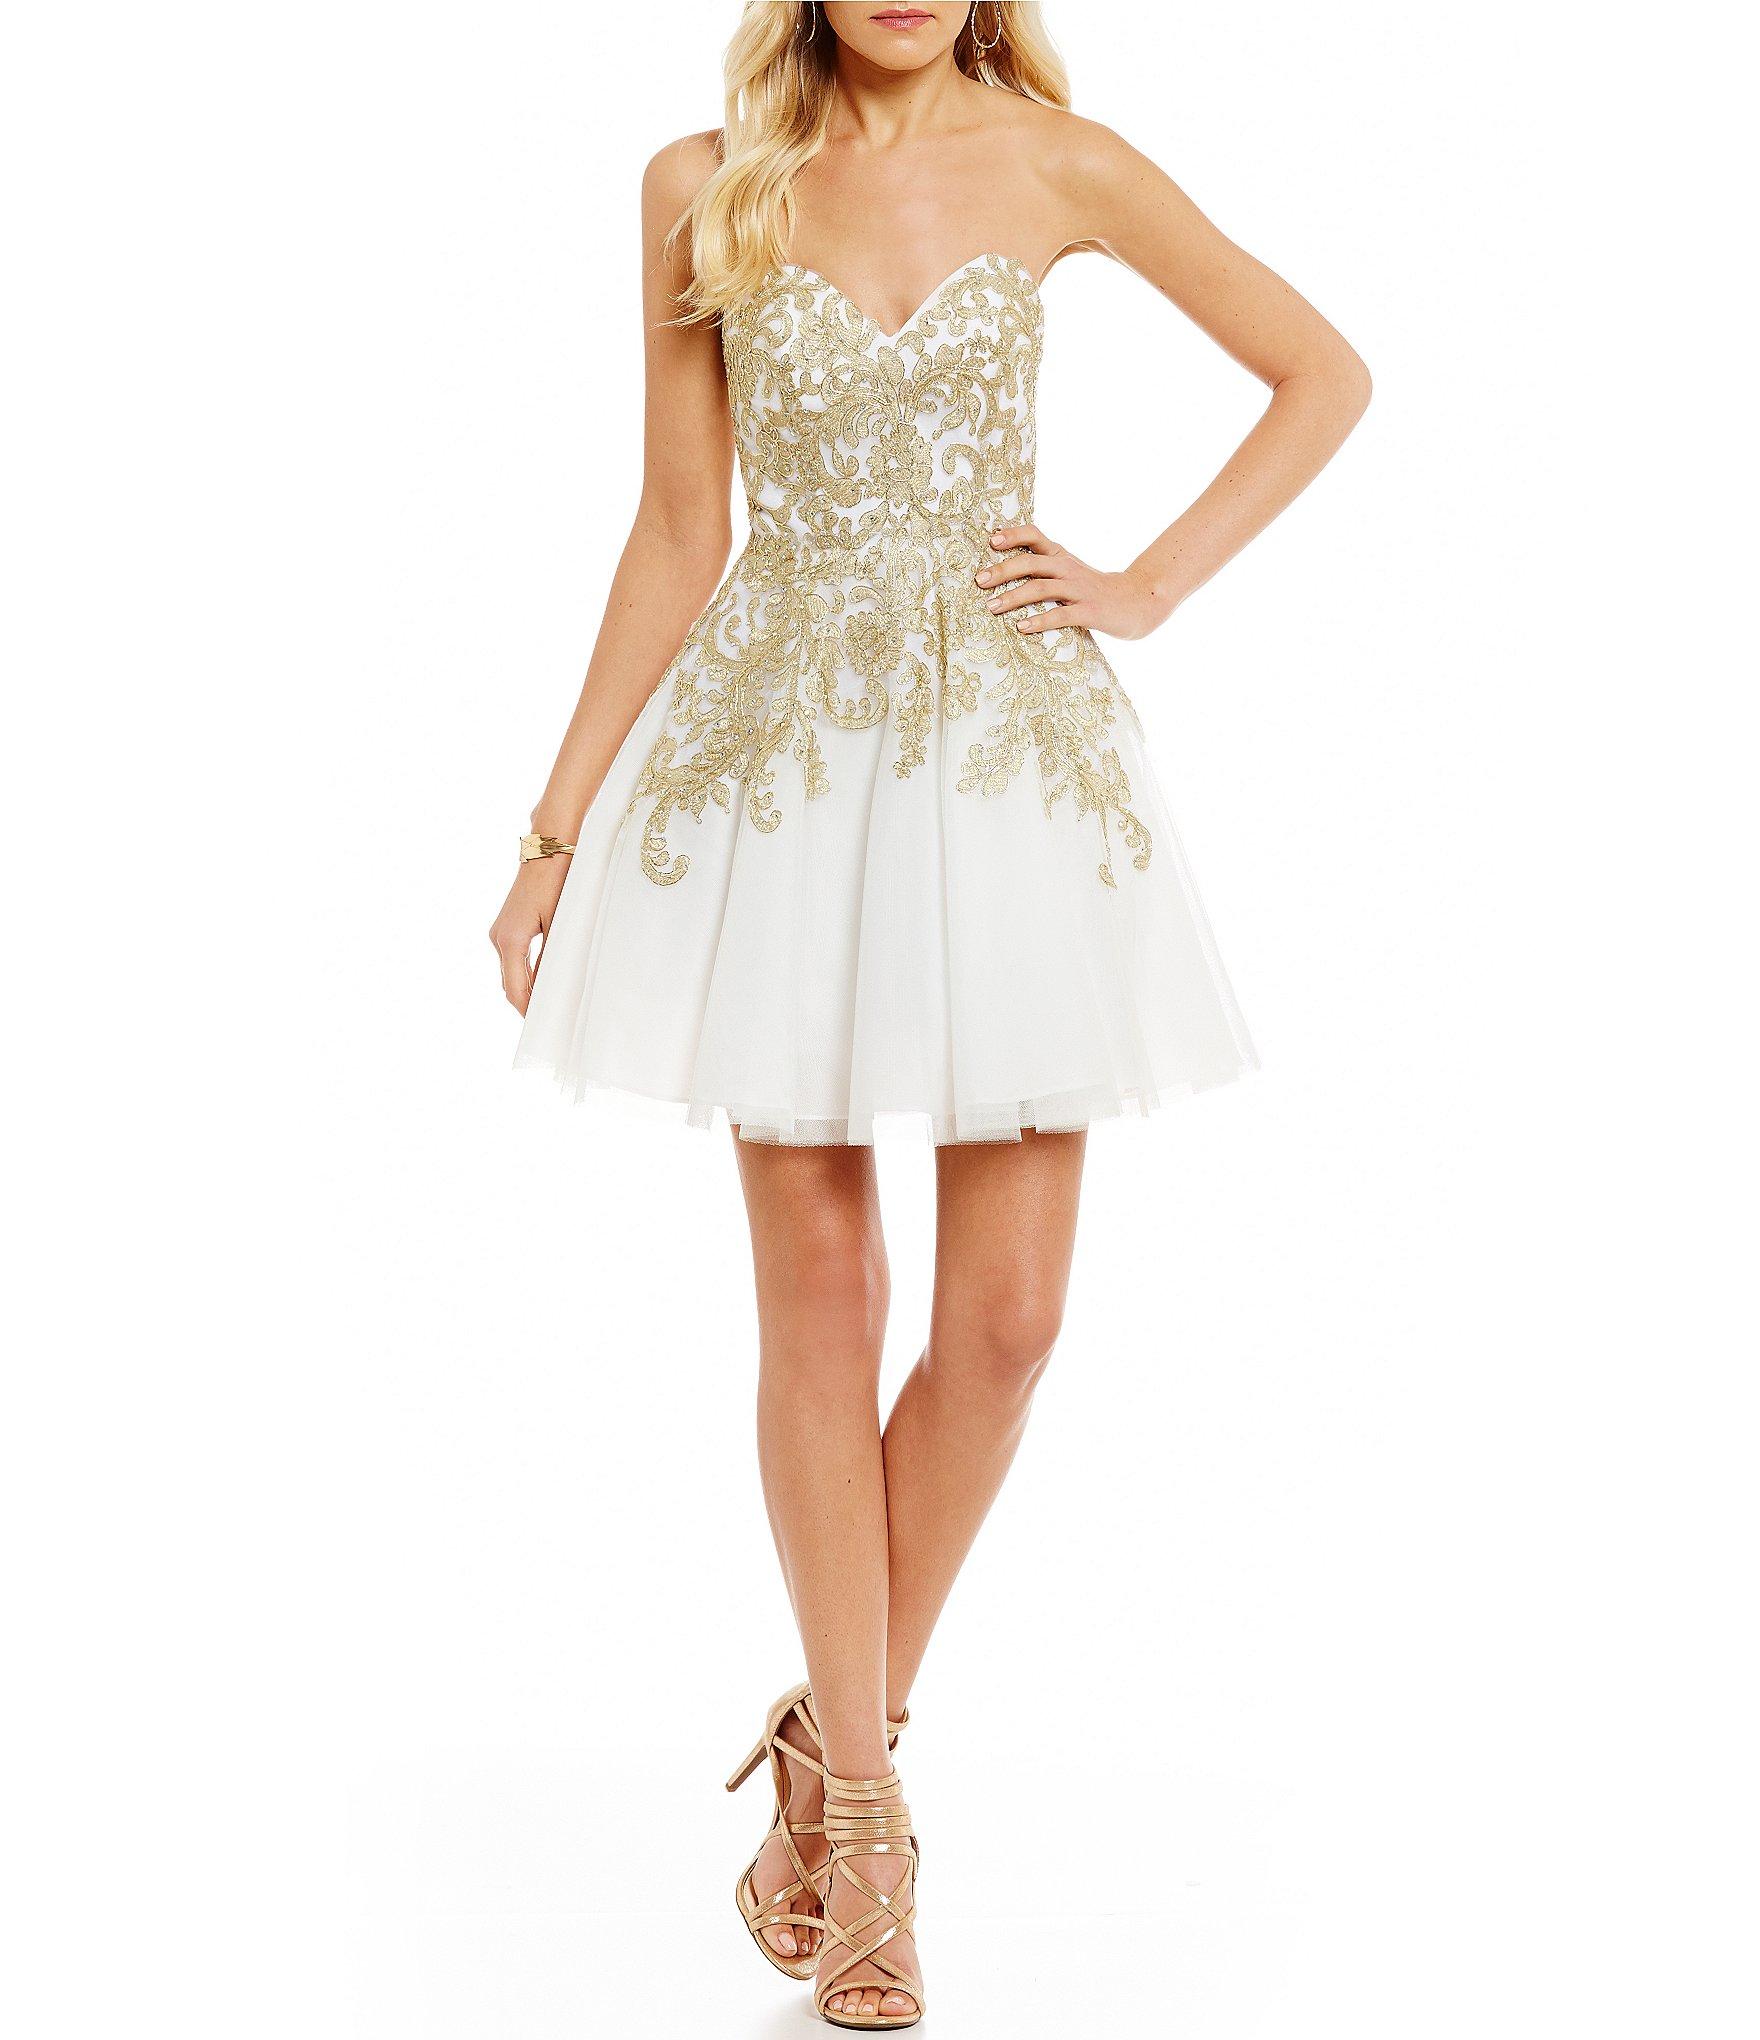 B darling dresses / Active Coupons